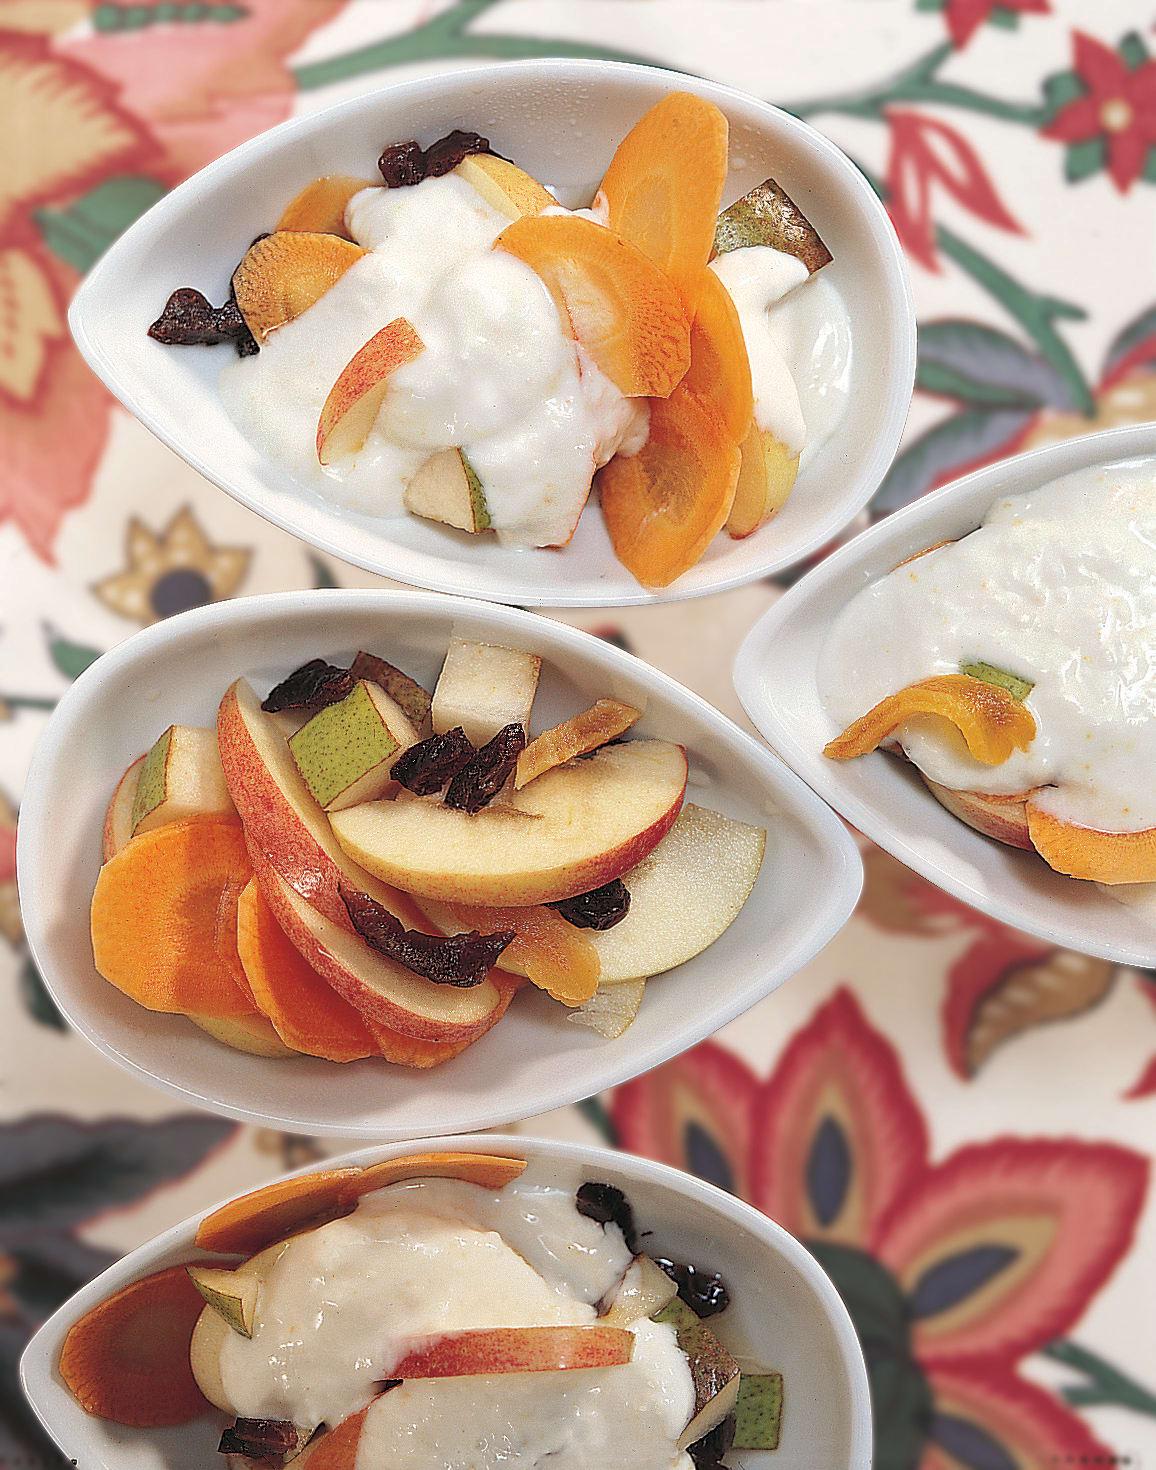 Rüeblifruchtsalat mit Joghurt (Low Carb)